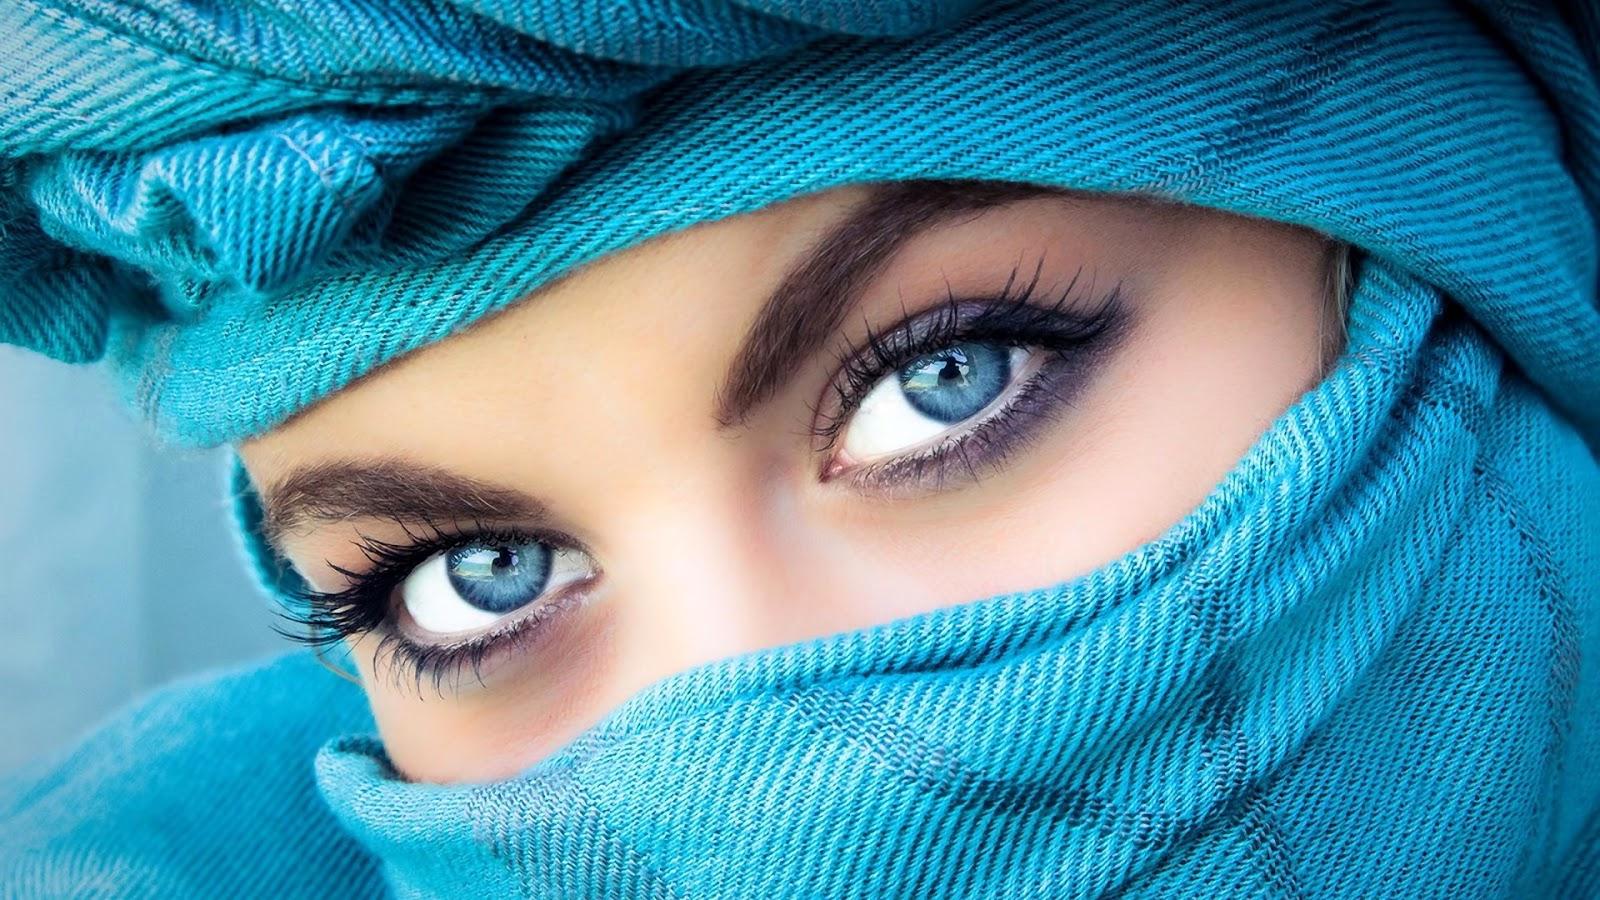 Inilah 8 Penyebab Mata Kedutan yang Sering Kamu Alami!